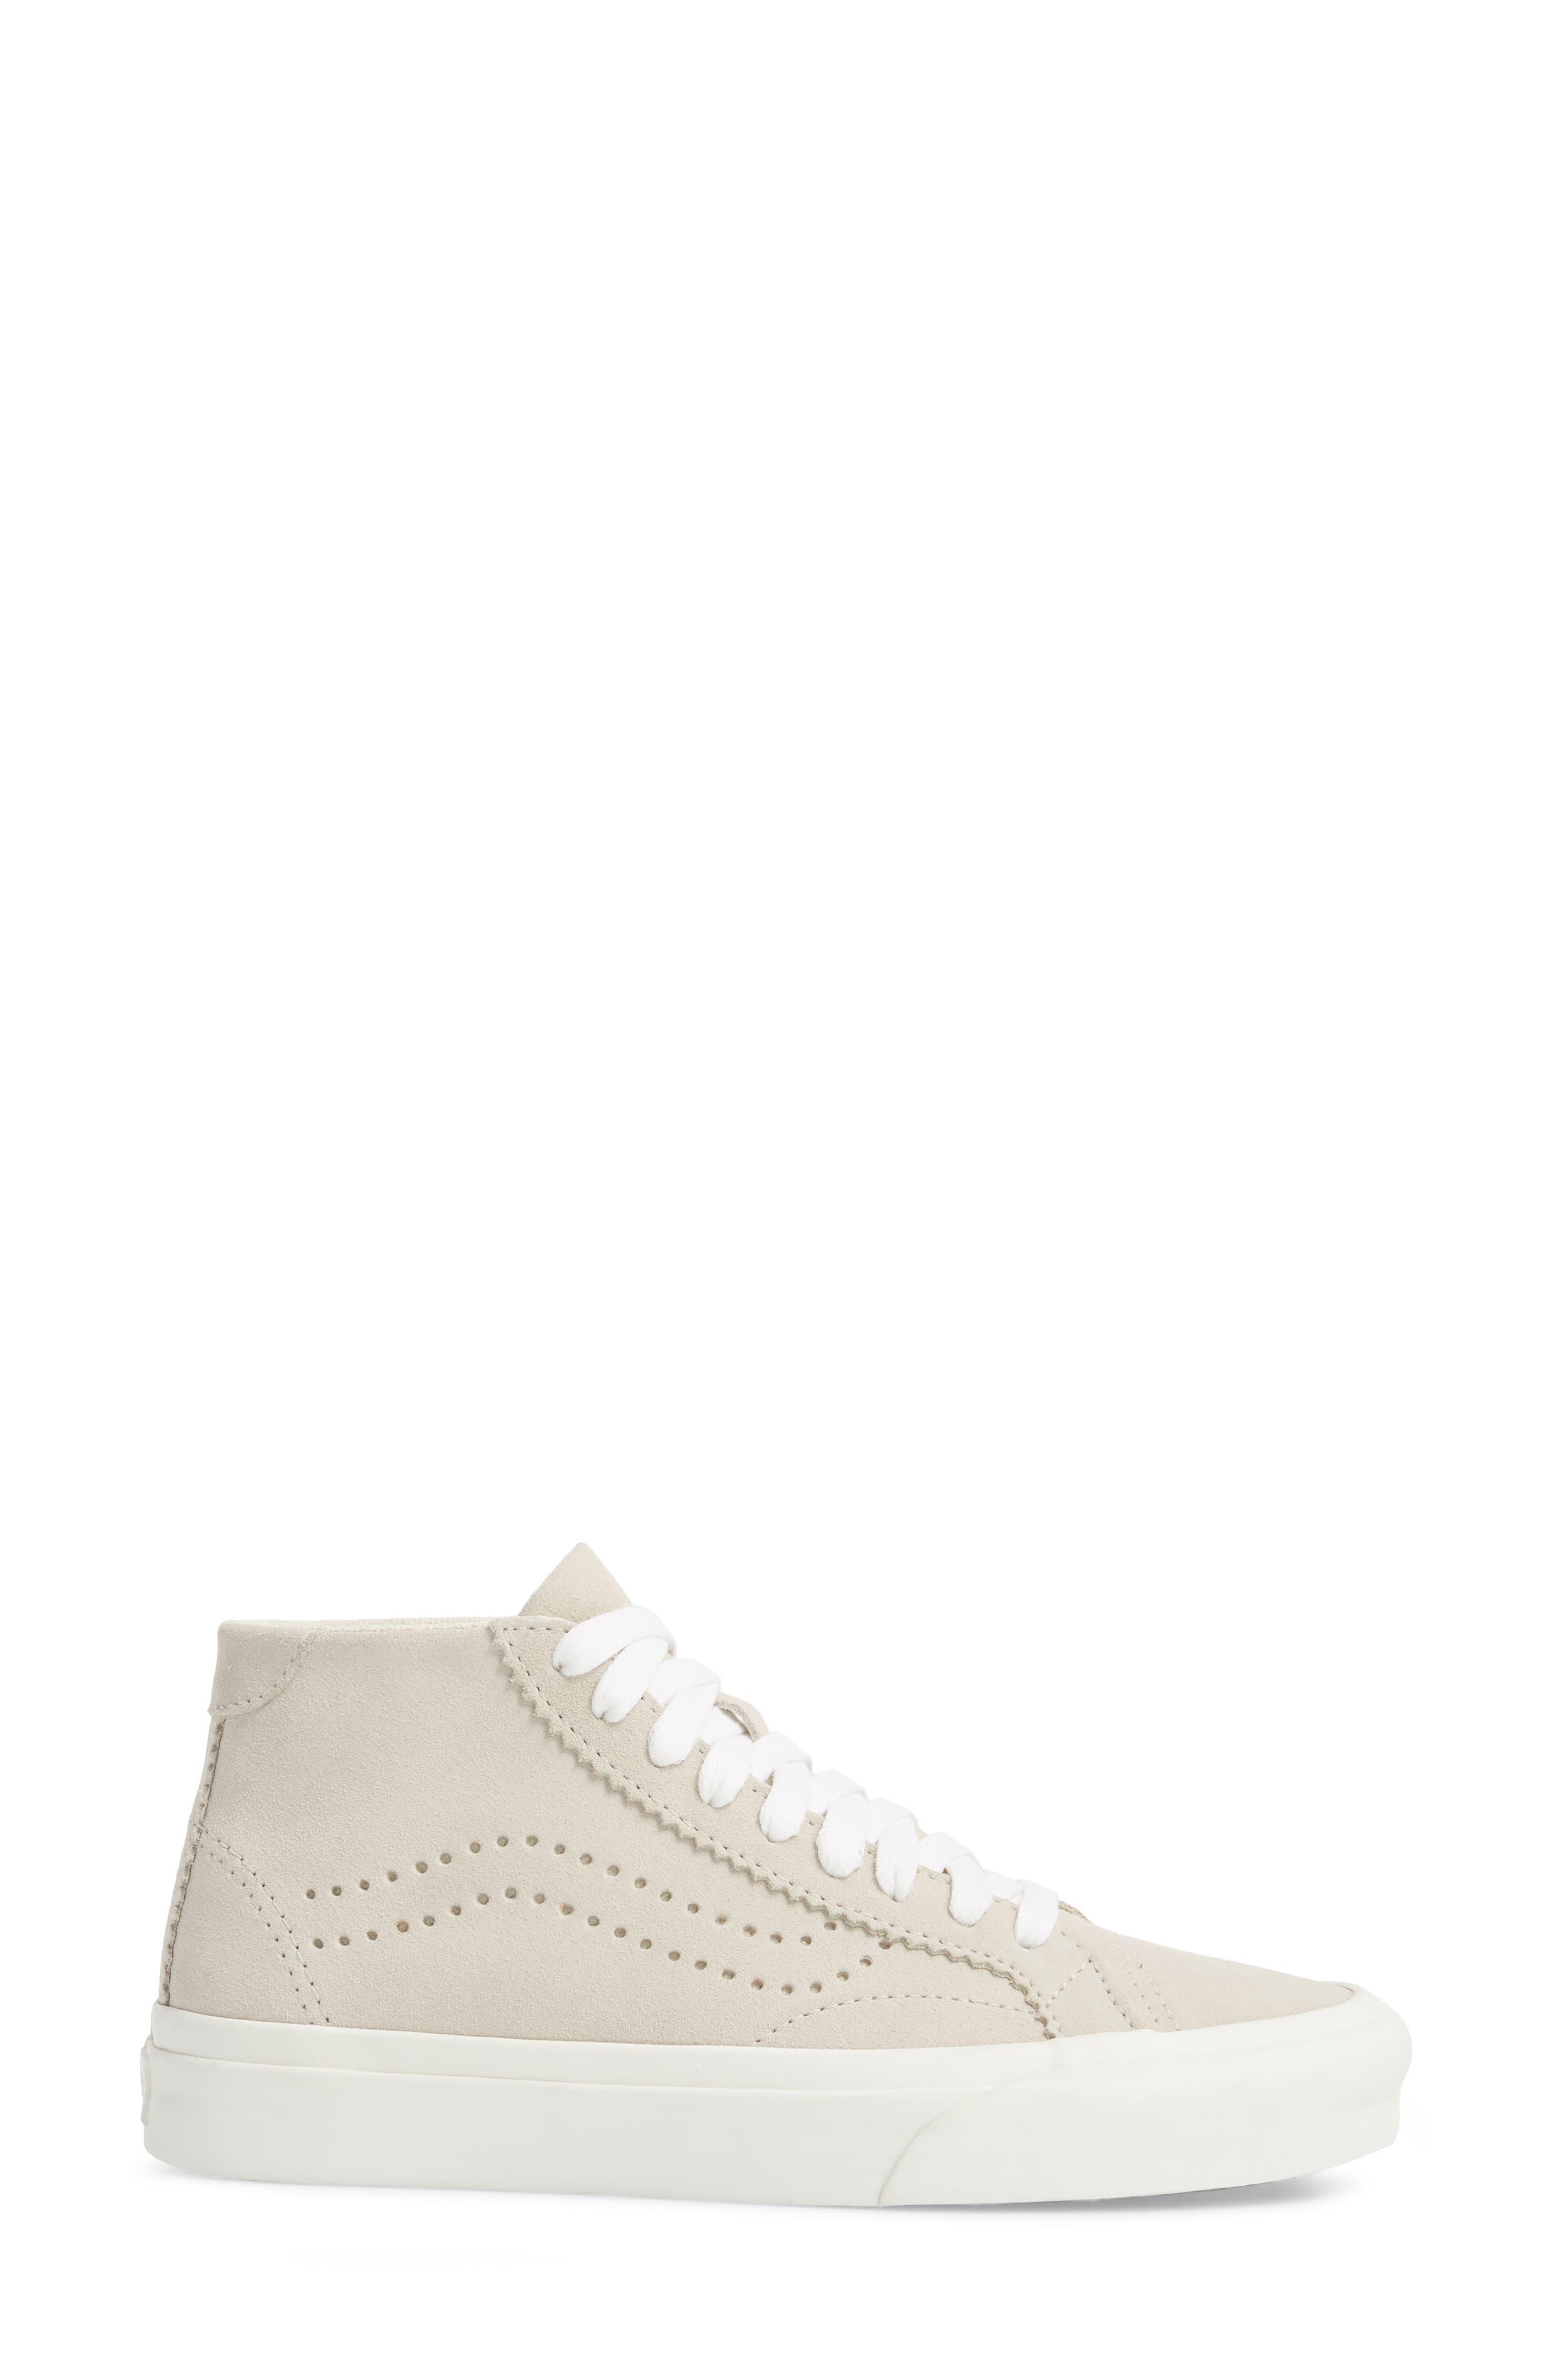 Court DX Mid Sneaker,                             Alternate thumbnail 3, color,                             040